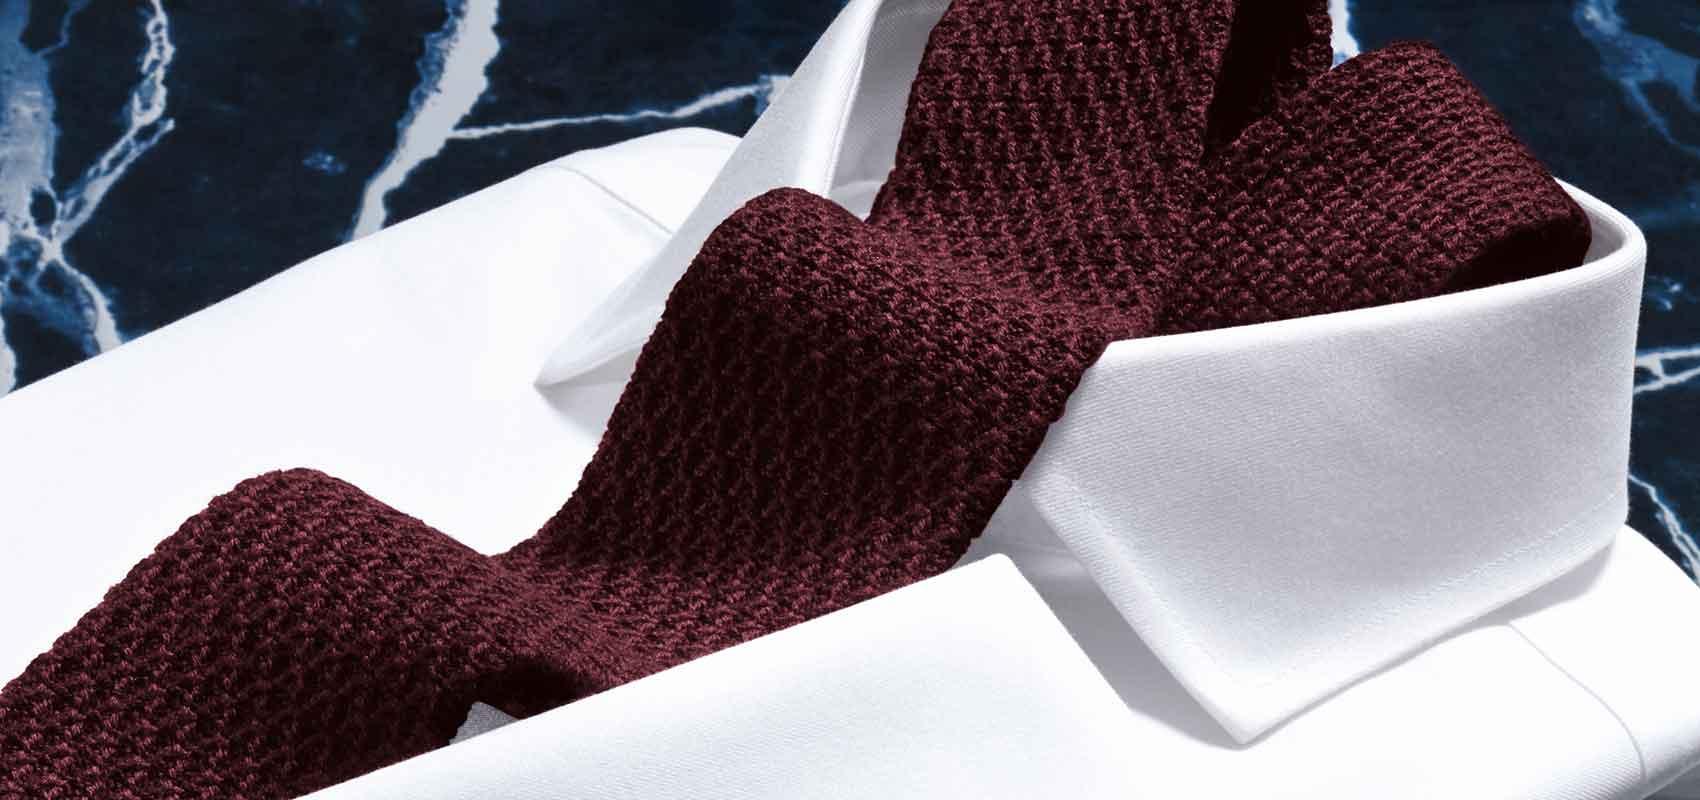 Charles Tyrwhitt men's shirts